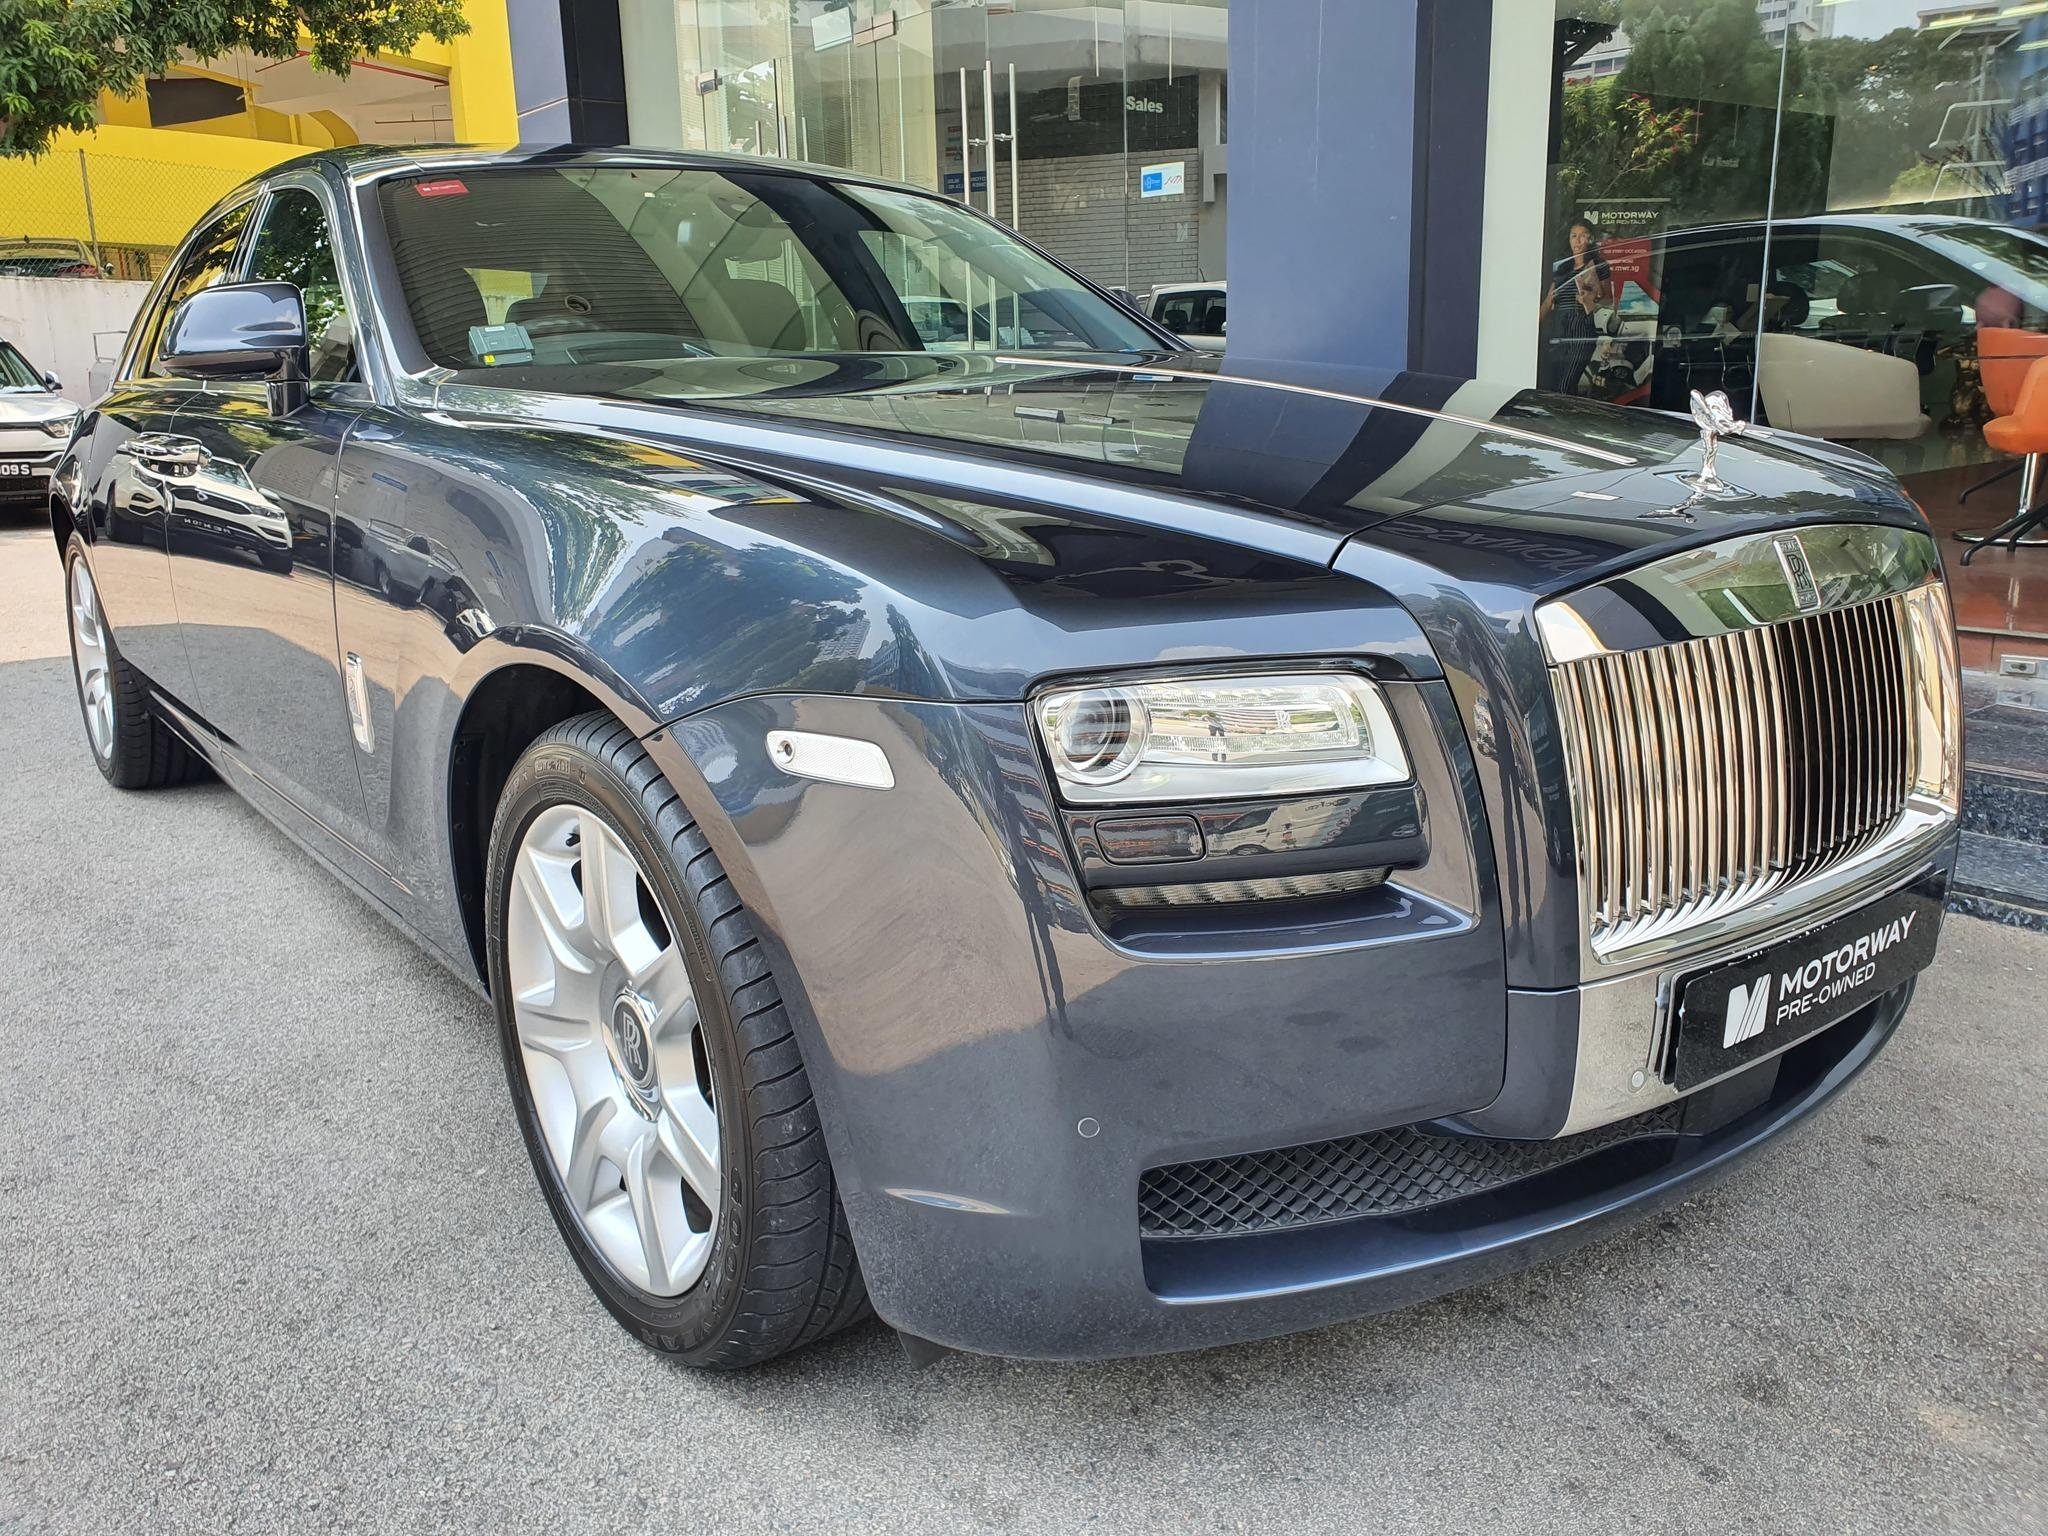 Rolls-Royce Ghost 6.6 Auto